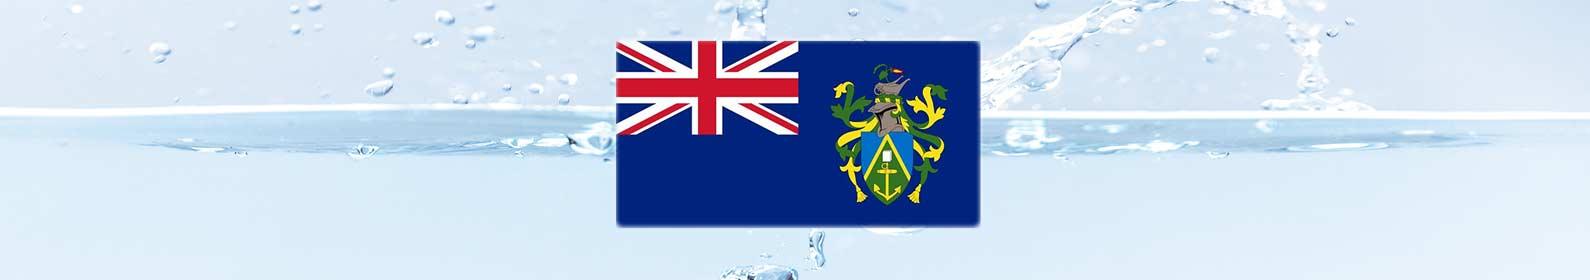 water-treatment-pitcairn-islands.jpg